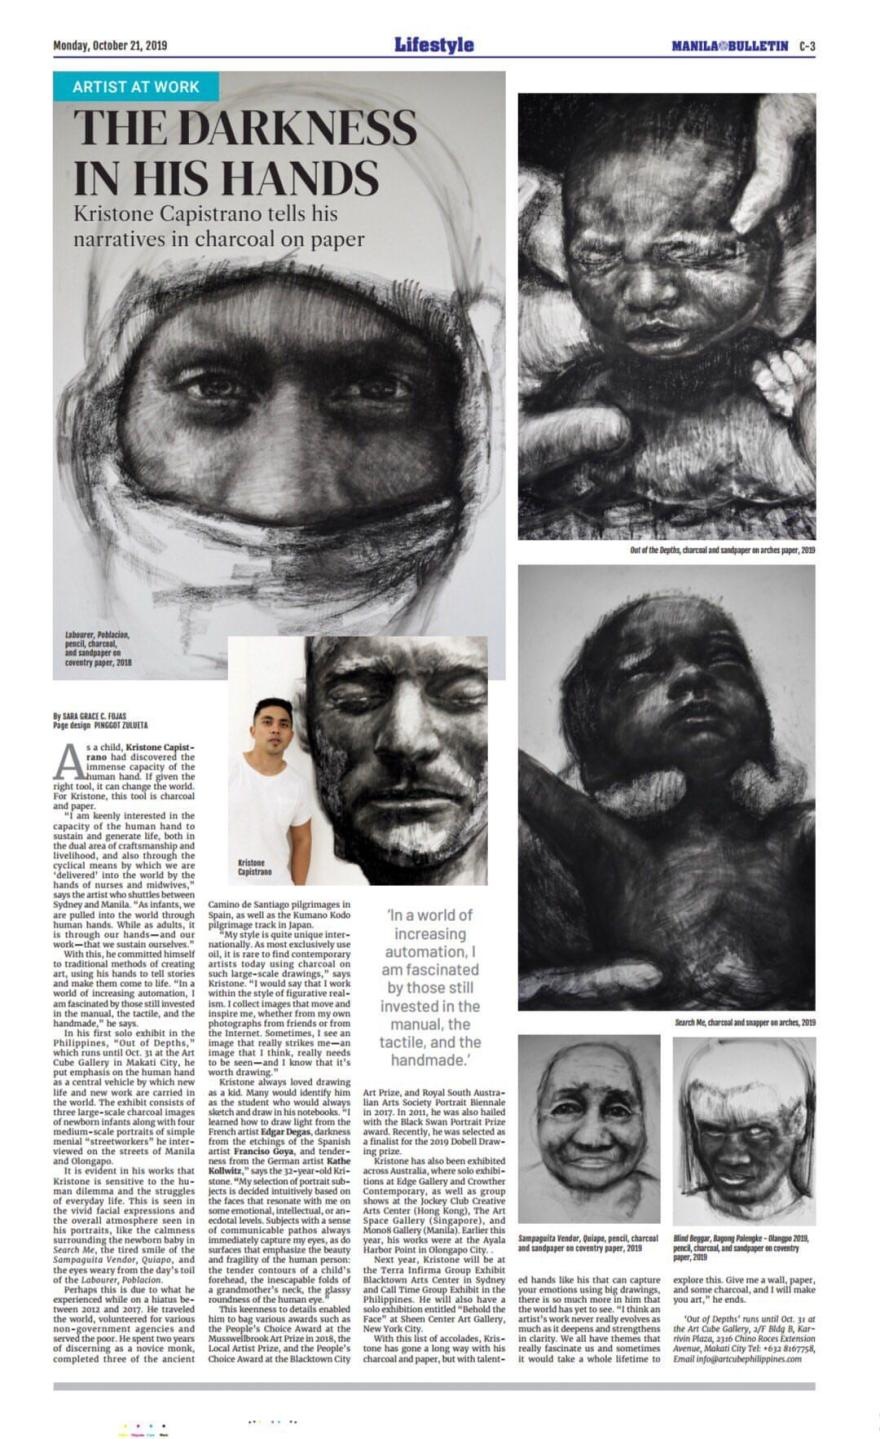 Kristone Capistrano Art News Philippines Manilaart Manila